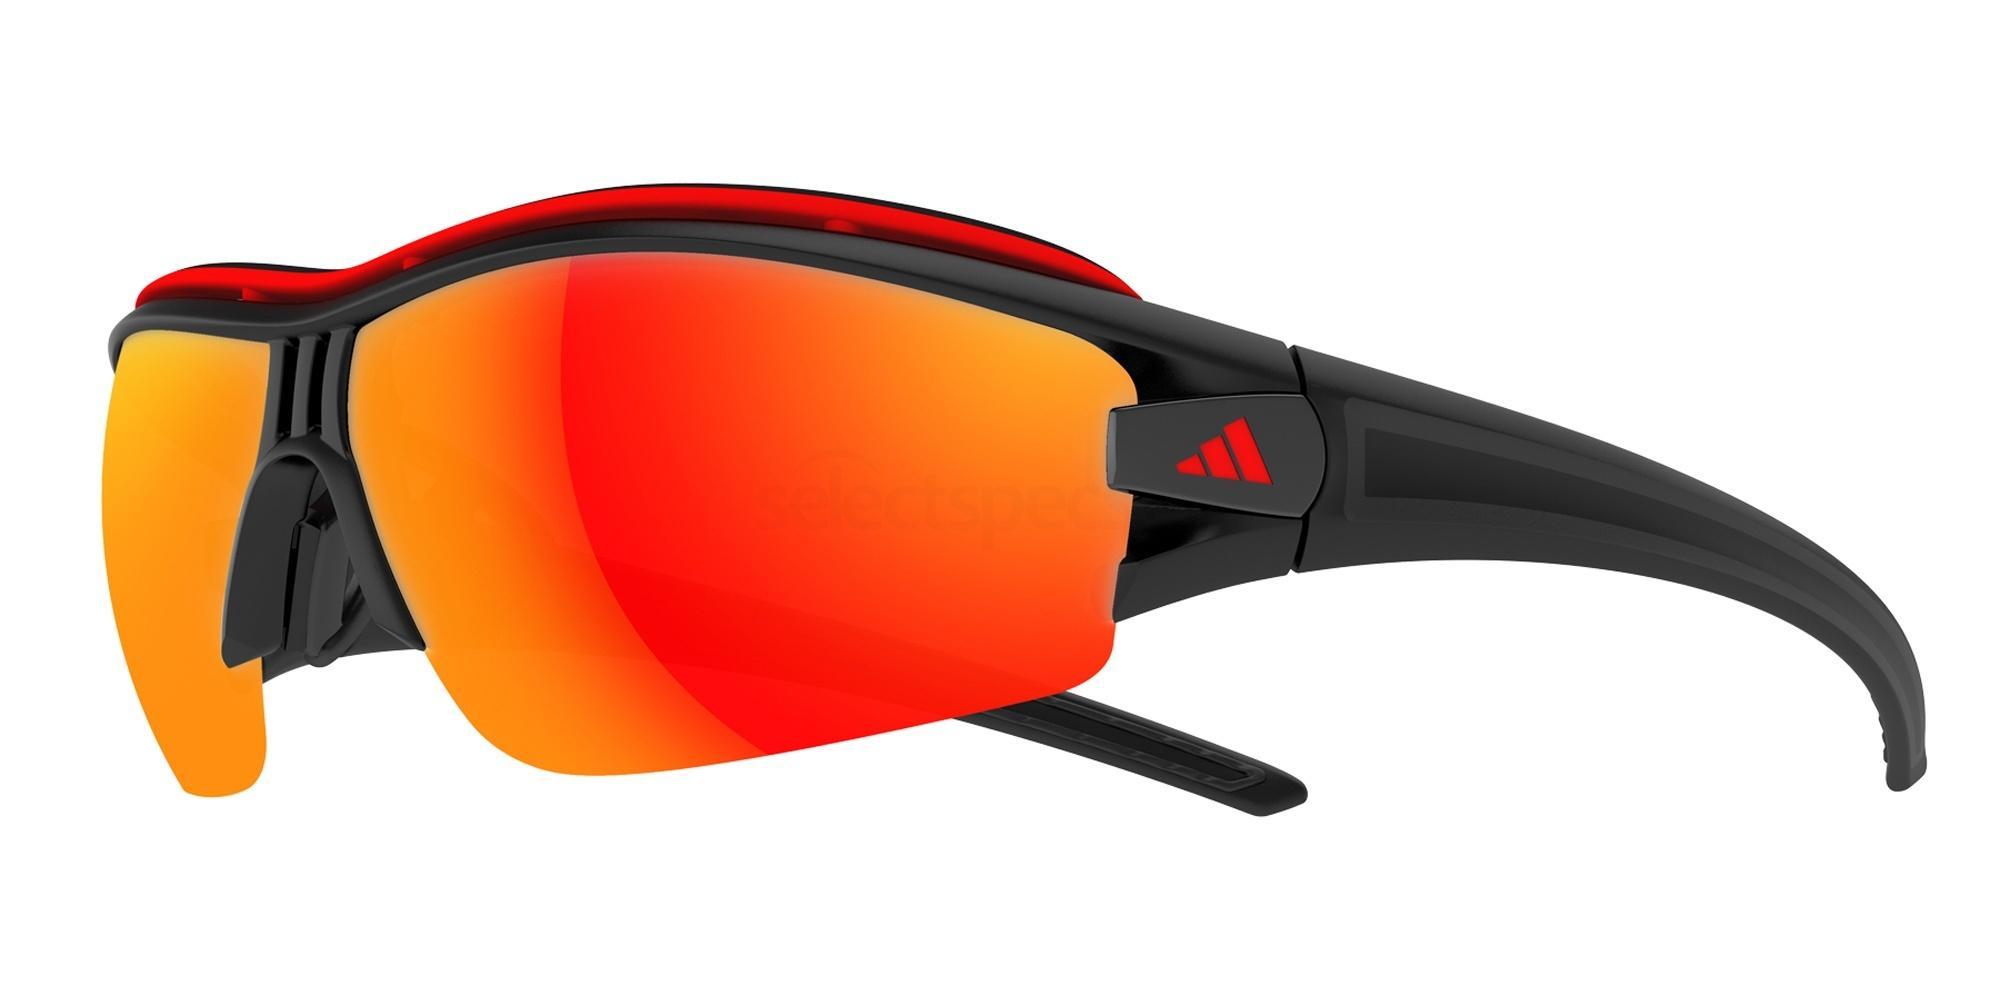 a199 00 6088 a199 Evil Eye Halfrim Pro XS Sunglasses, Adidas